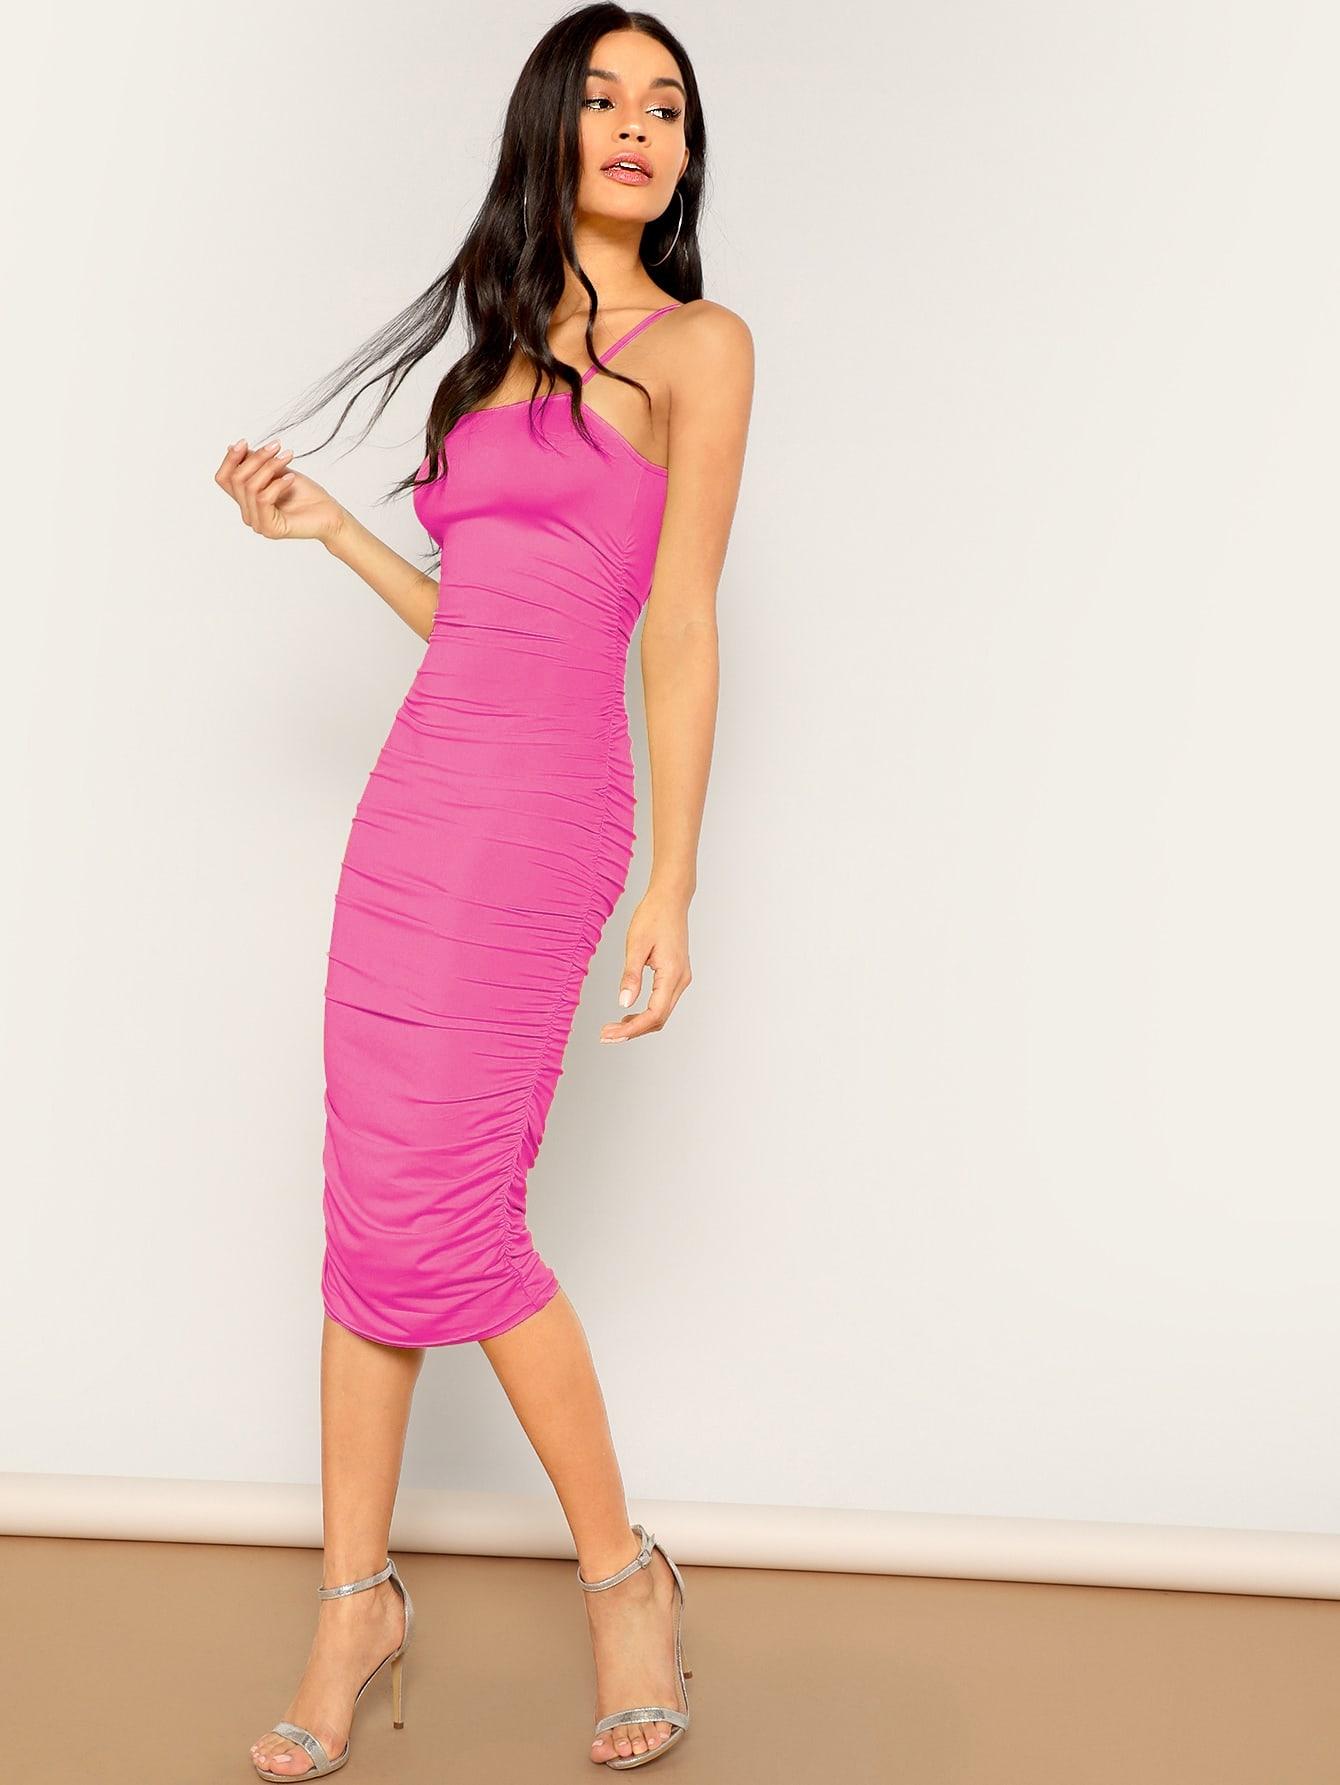 Фото - Платье-карандаш на бретелях со сборками от SheIn цвет розовые